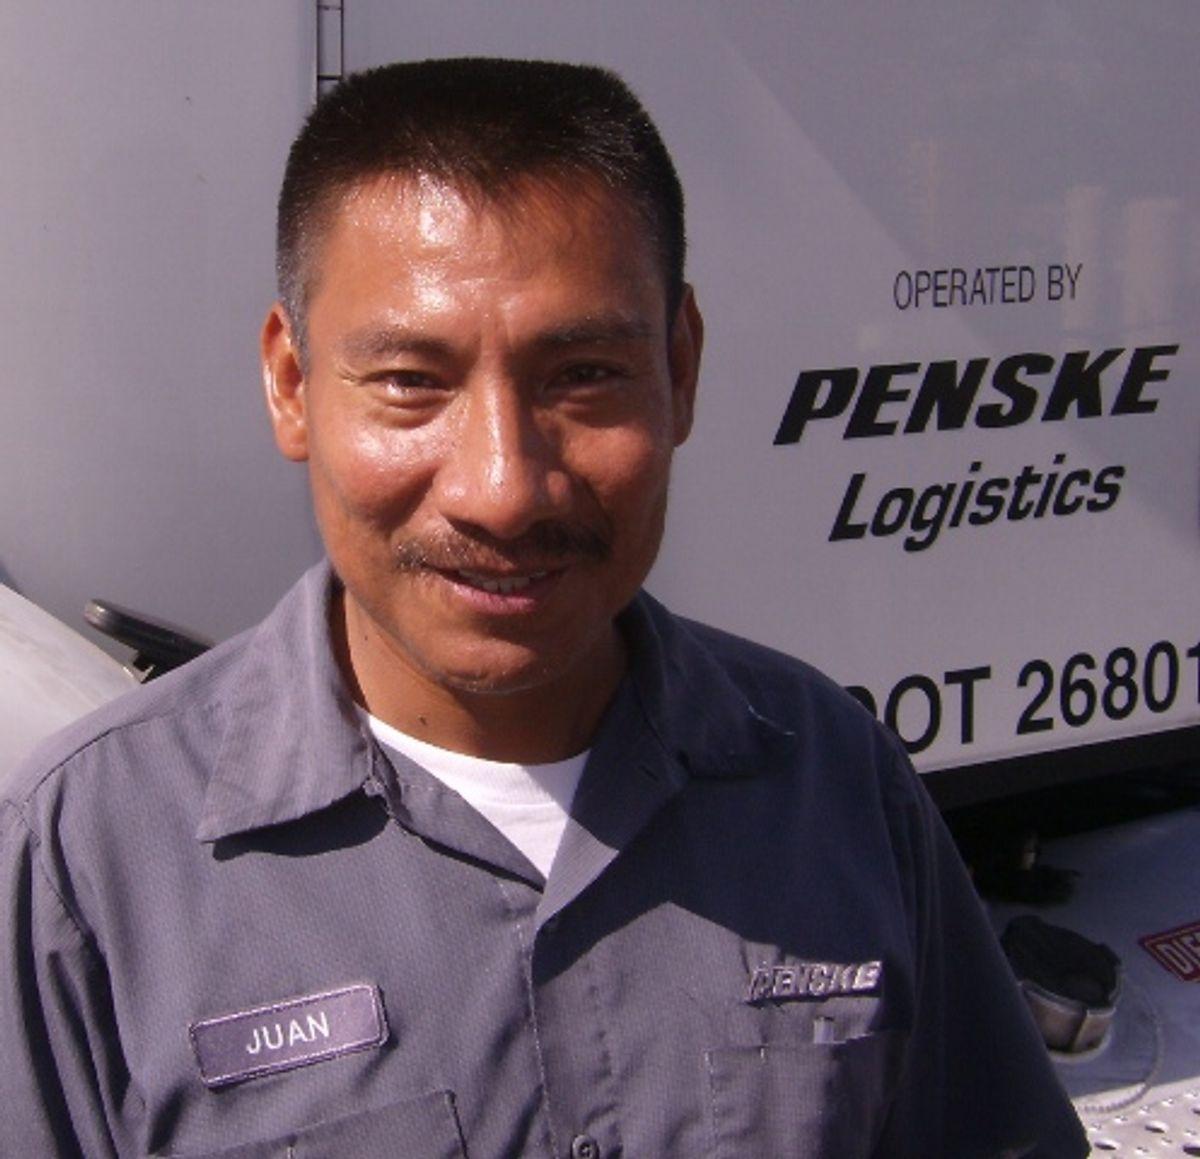 Penske Logistics Truck Drivers Deliver Excellence